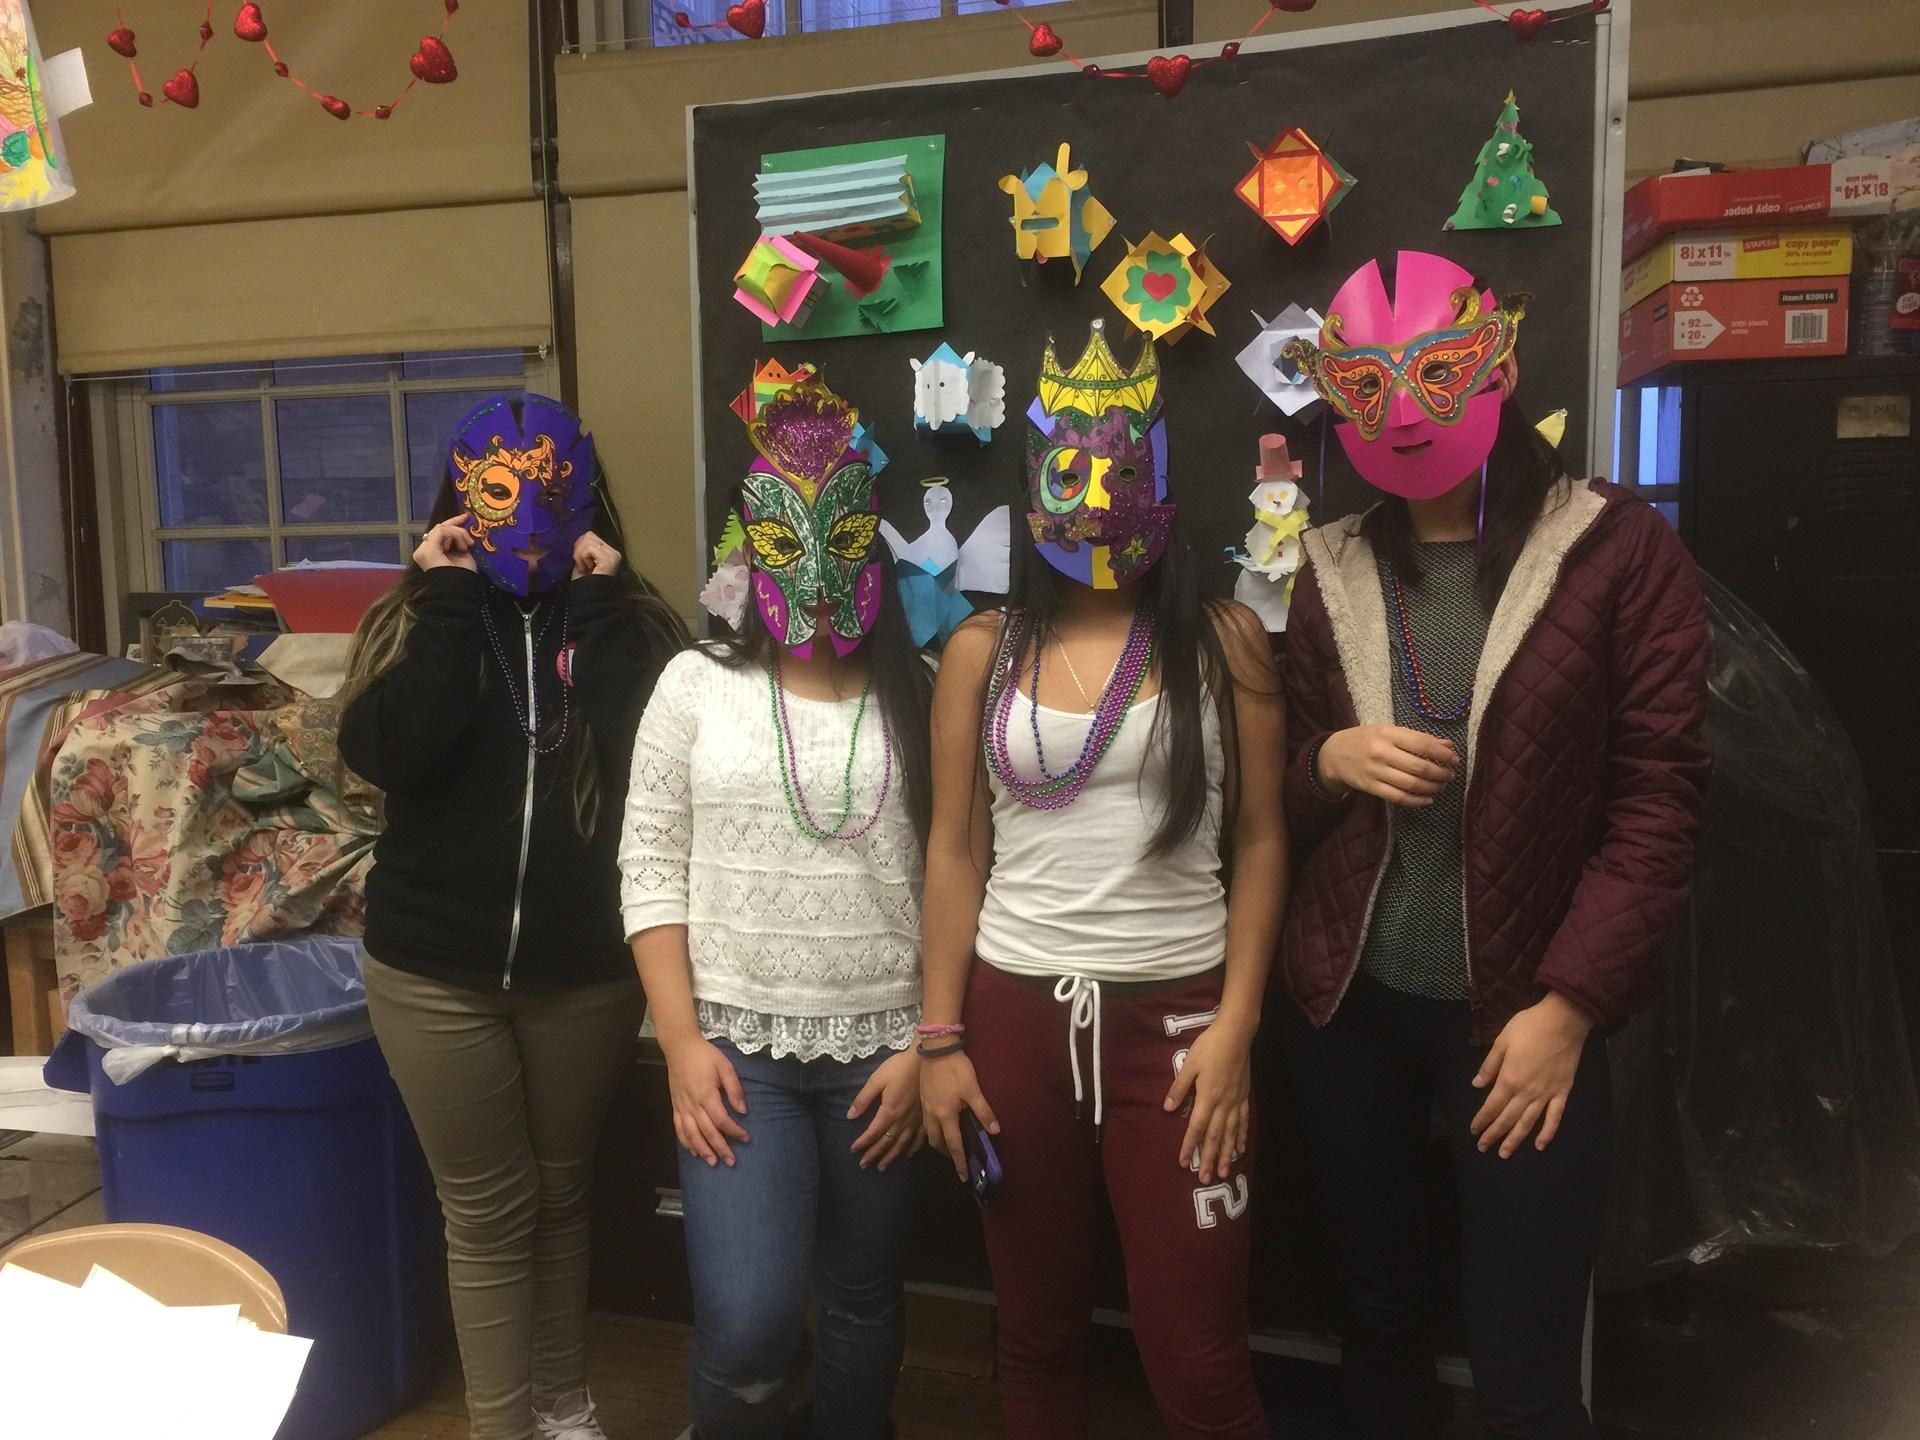 Students wearing Mardi gras masks